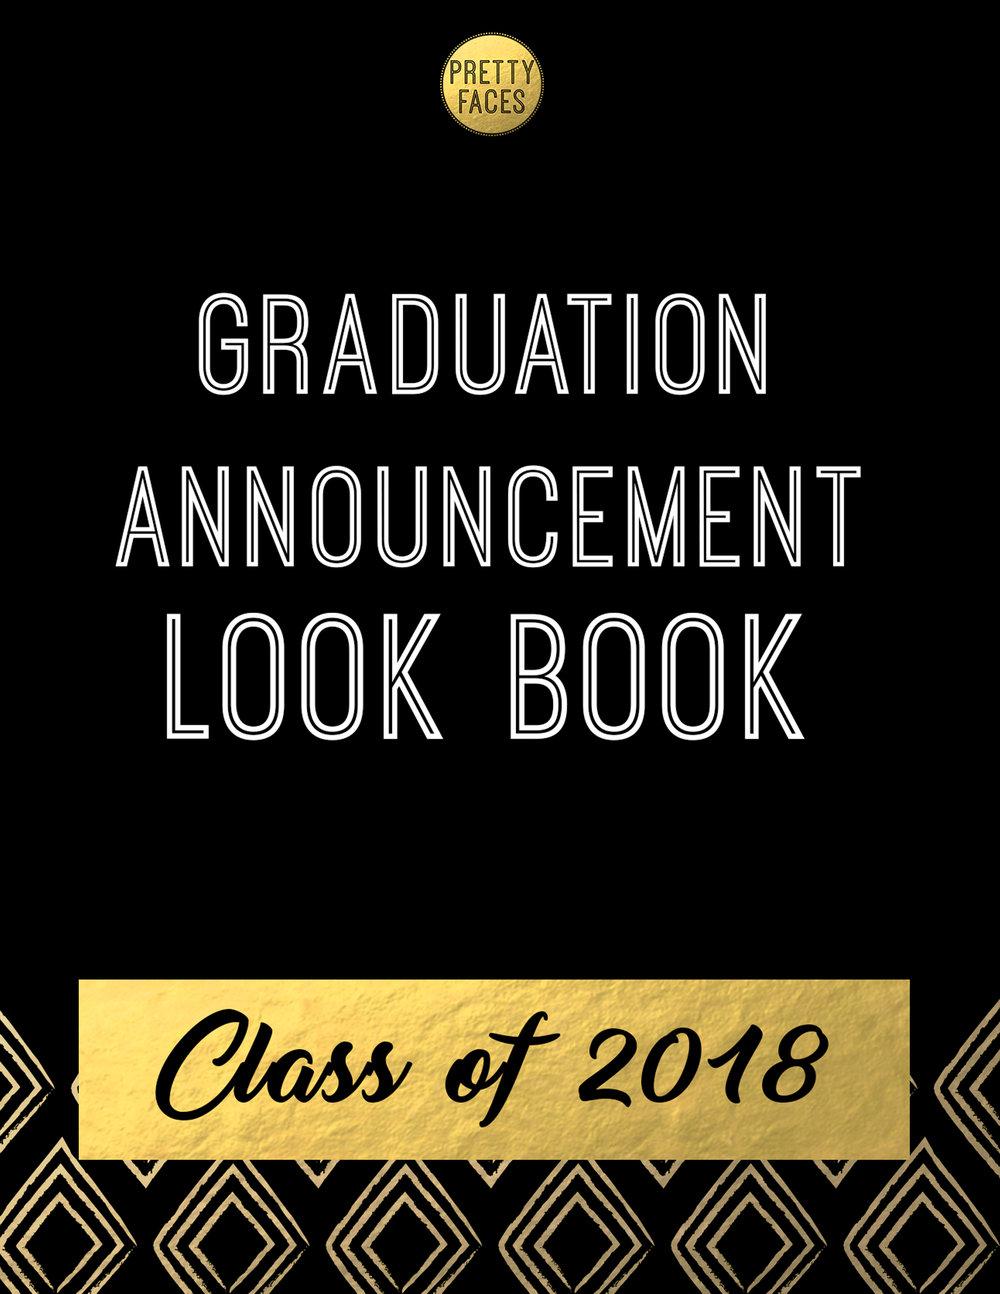 2018 LookBook Cover.jpg